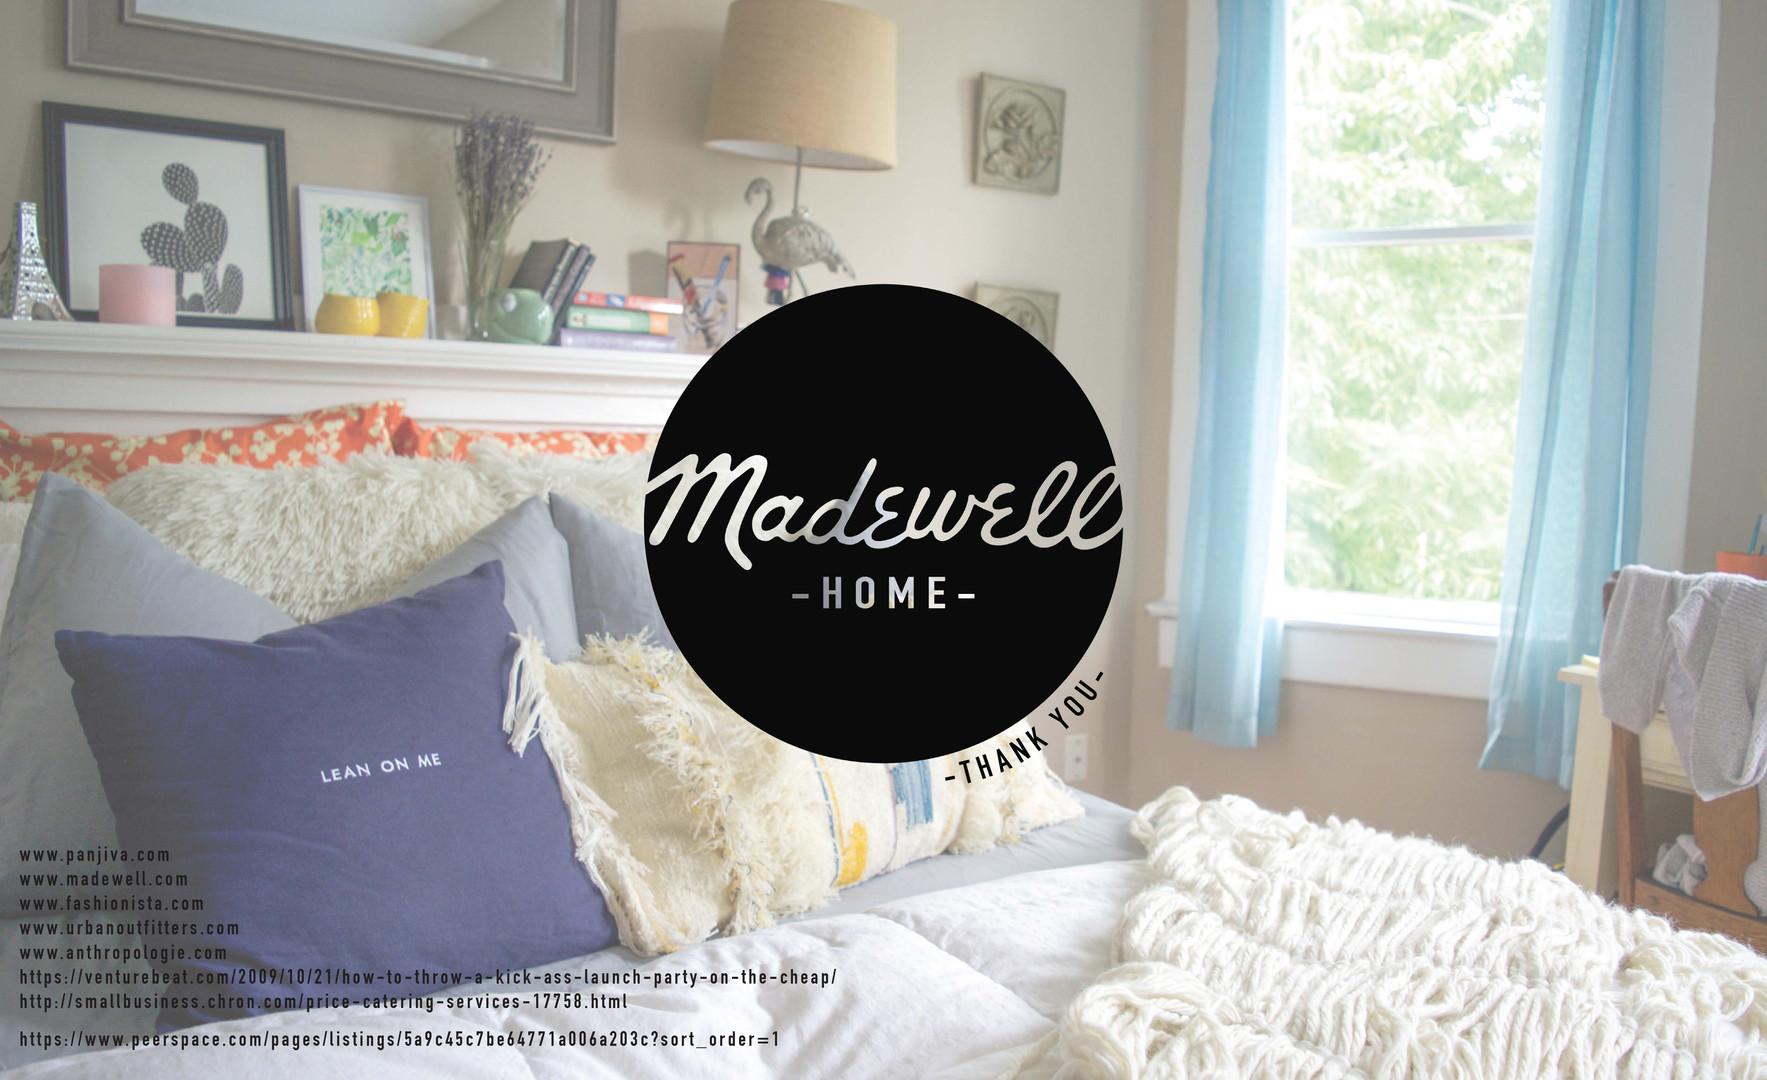 MadewellHomepresentation_Page_30.jpg